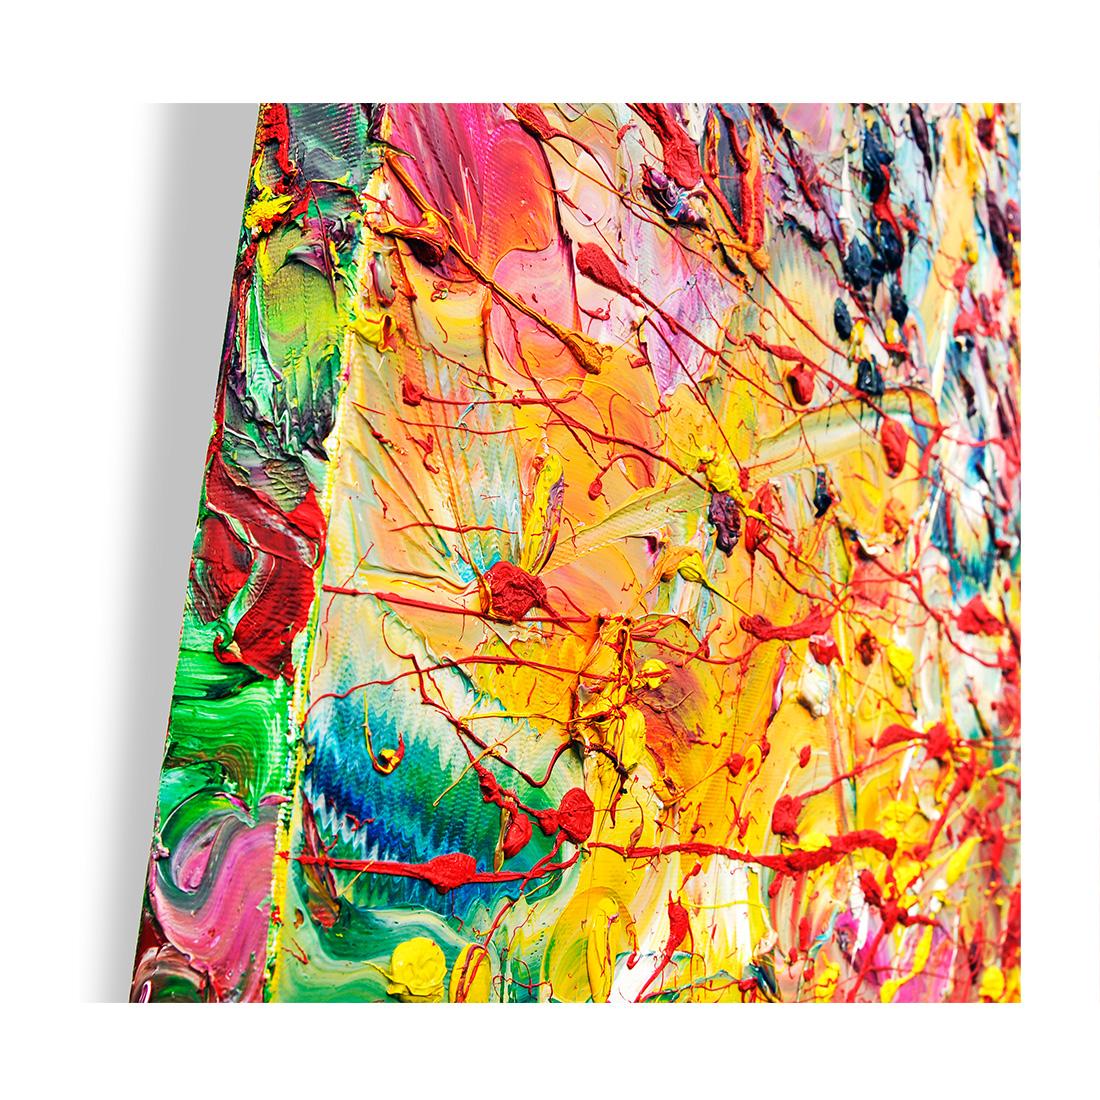 POLLINE E BRUSIO - Olio su Tela - 100 x 70 - 2017-B